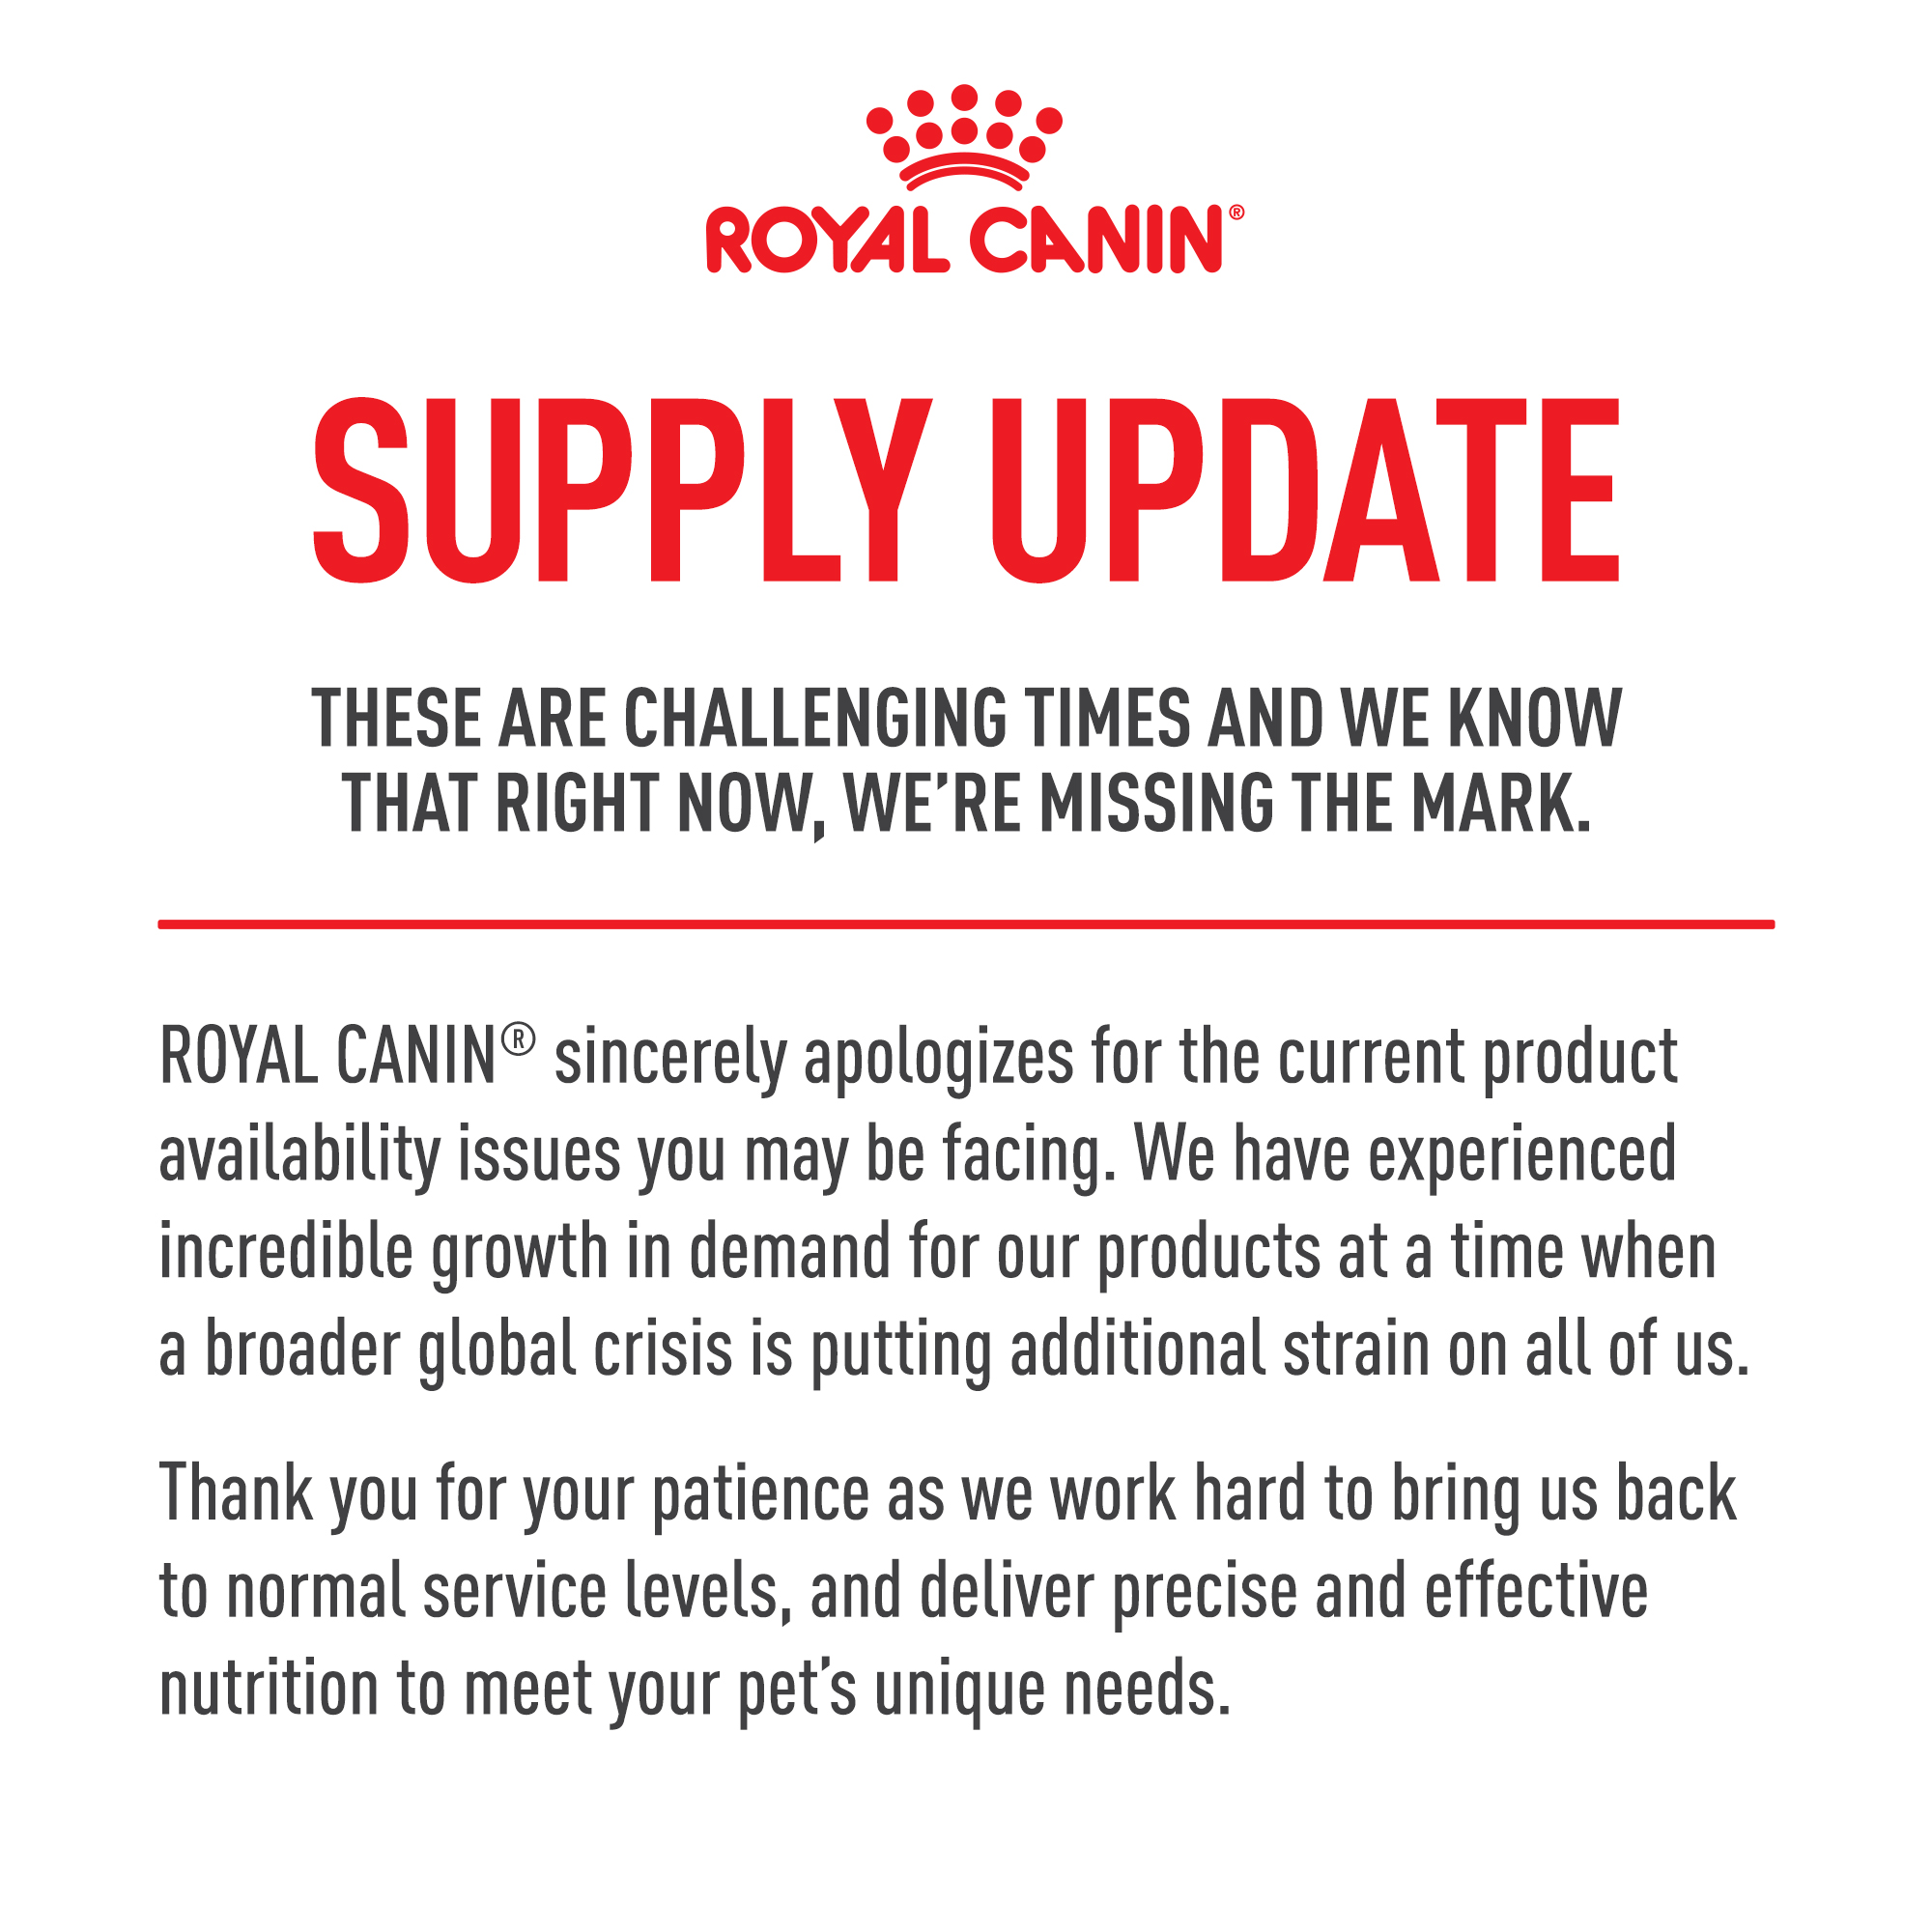 rc supply update